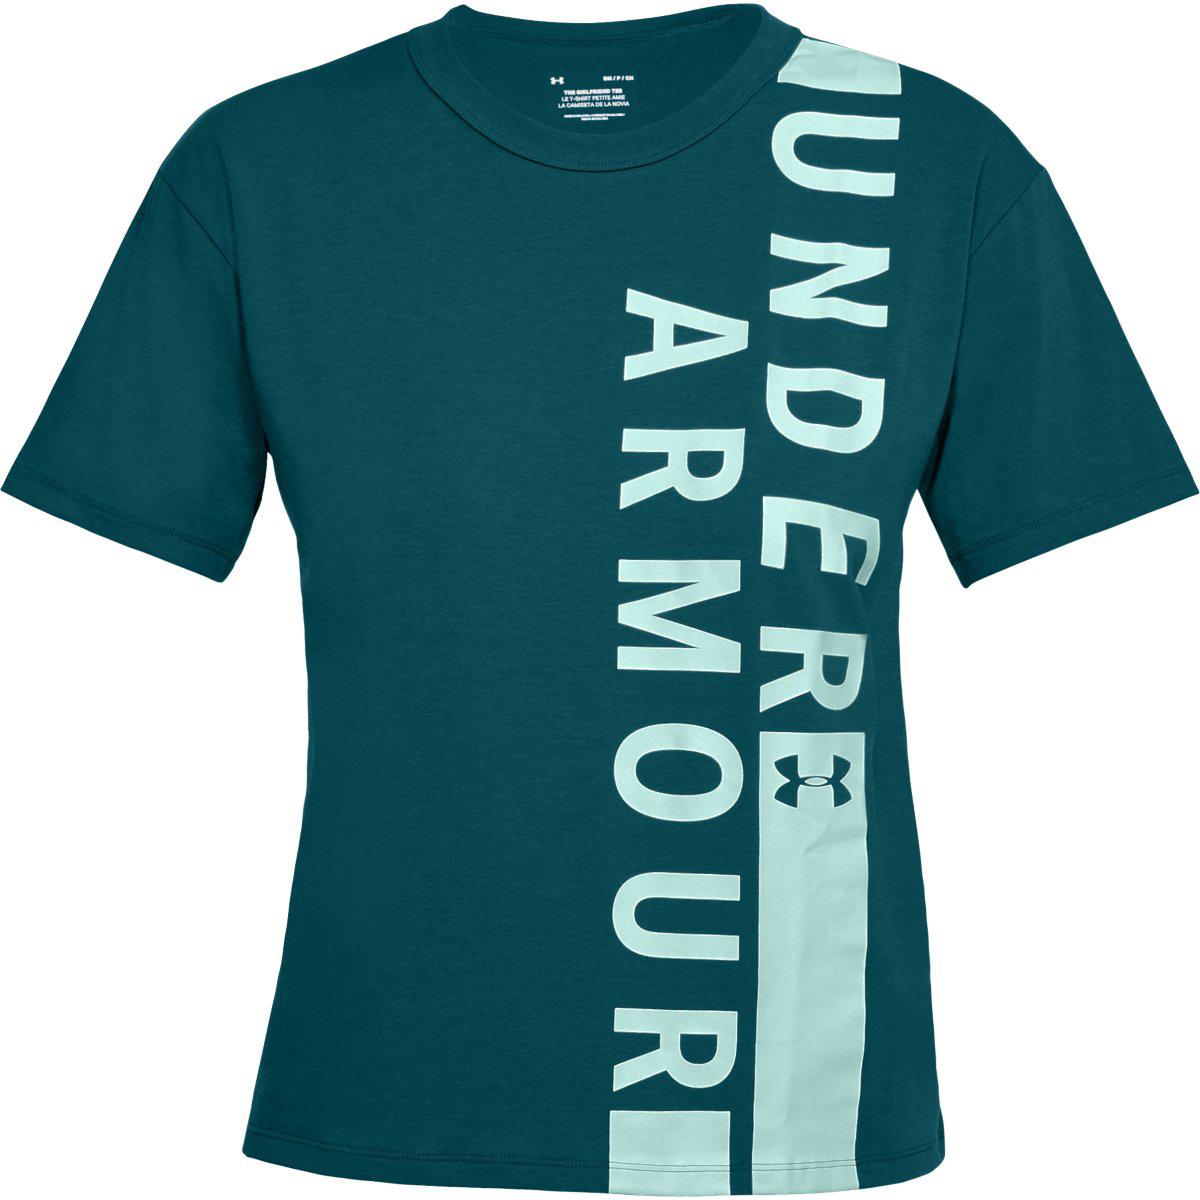 Under Armour Women's Ua Girlfriend Wordmark Crew Short-Sleeve Tee - Green, S